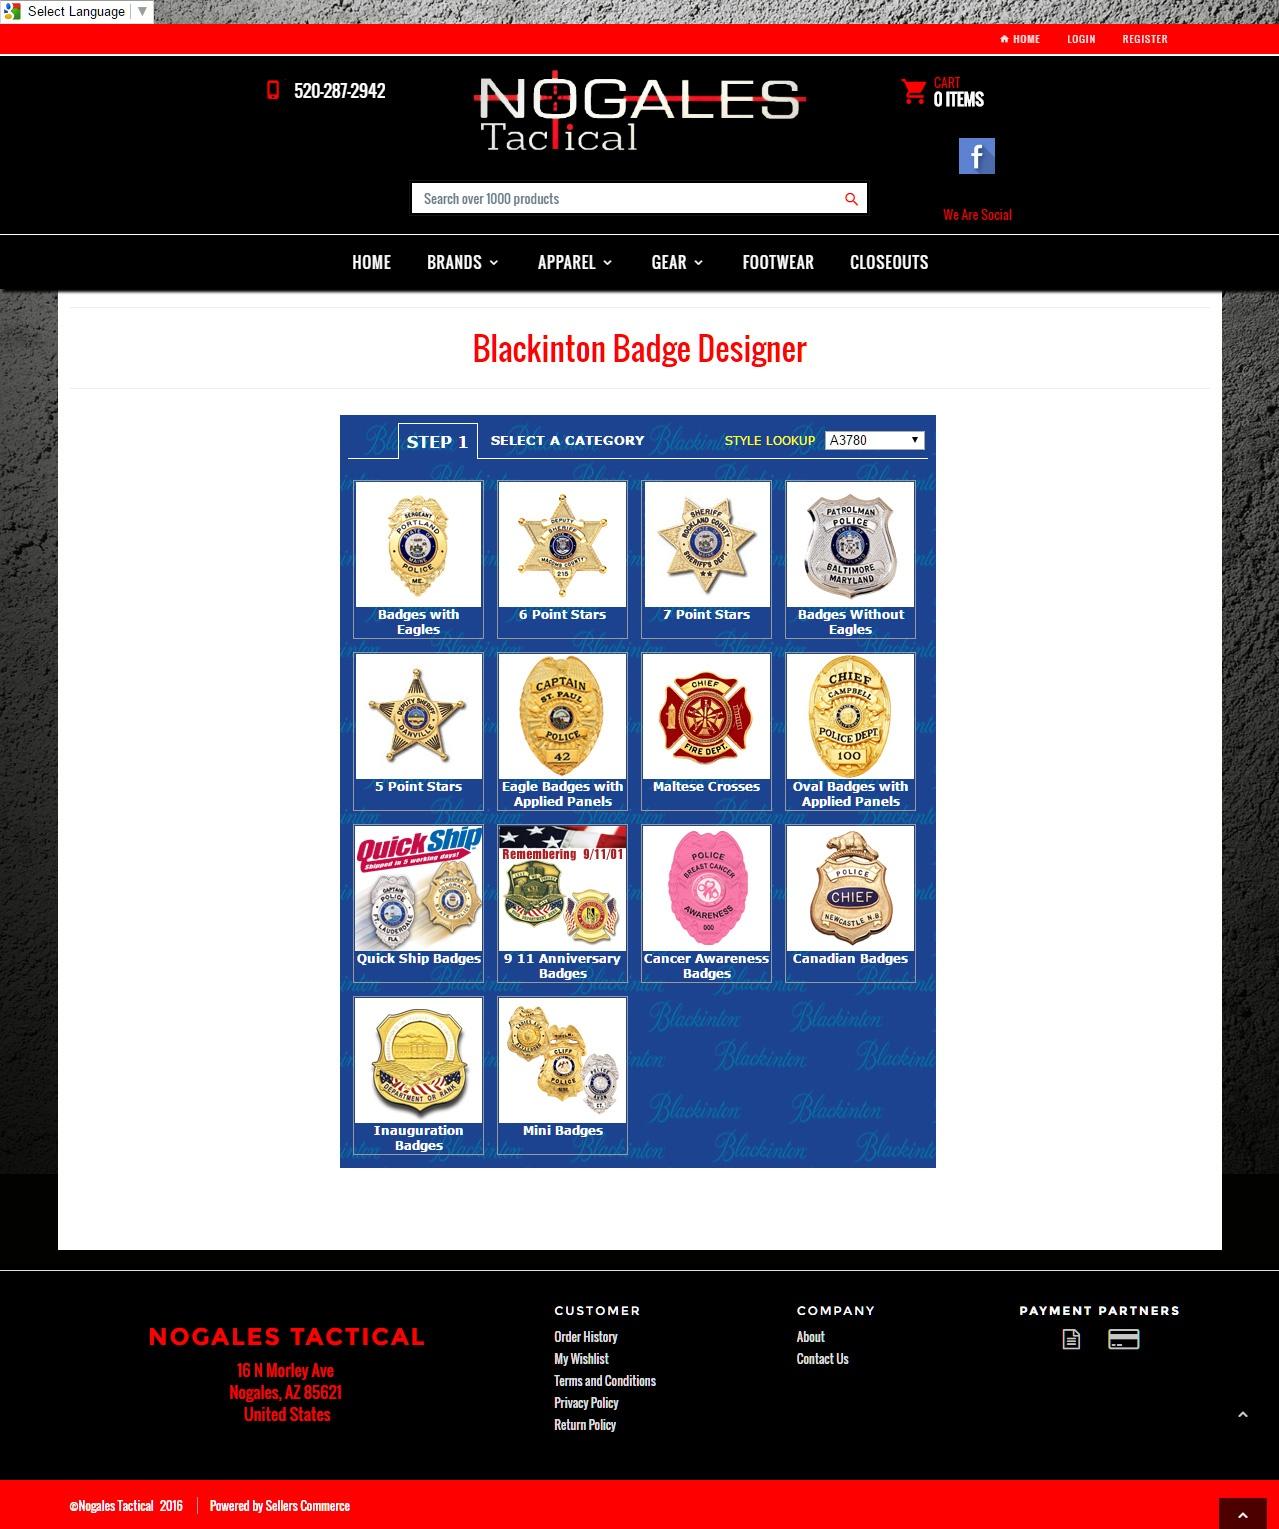 blackinton_badge_designer.jpg